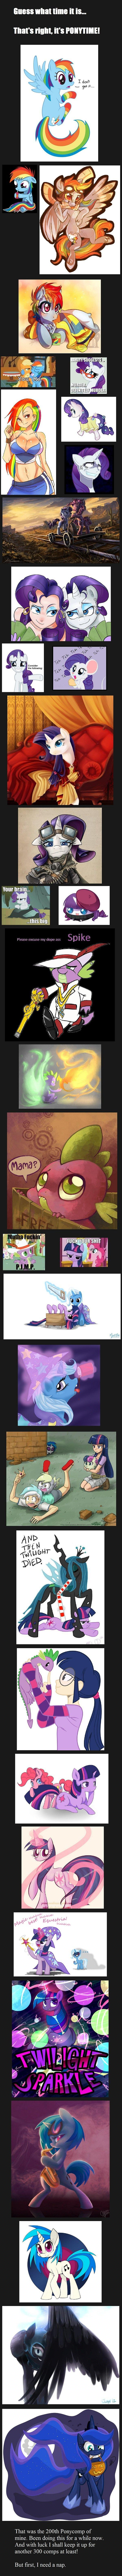 Ponycomp 200. Ponycomp 199: /channel/ponytime/Ponycomp+199/aXmhGnK/ DOWNLOAD LINK: docs.google.com/folder/d/0B4SOCzXHPRDVODdnWUpWZEJ0Zmc/edit.. Sleep, you deserve it. My Little Pony ponies ponytime